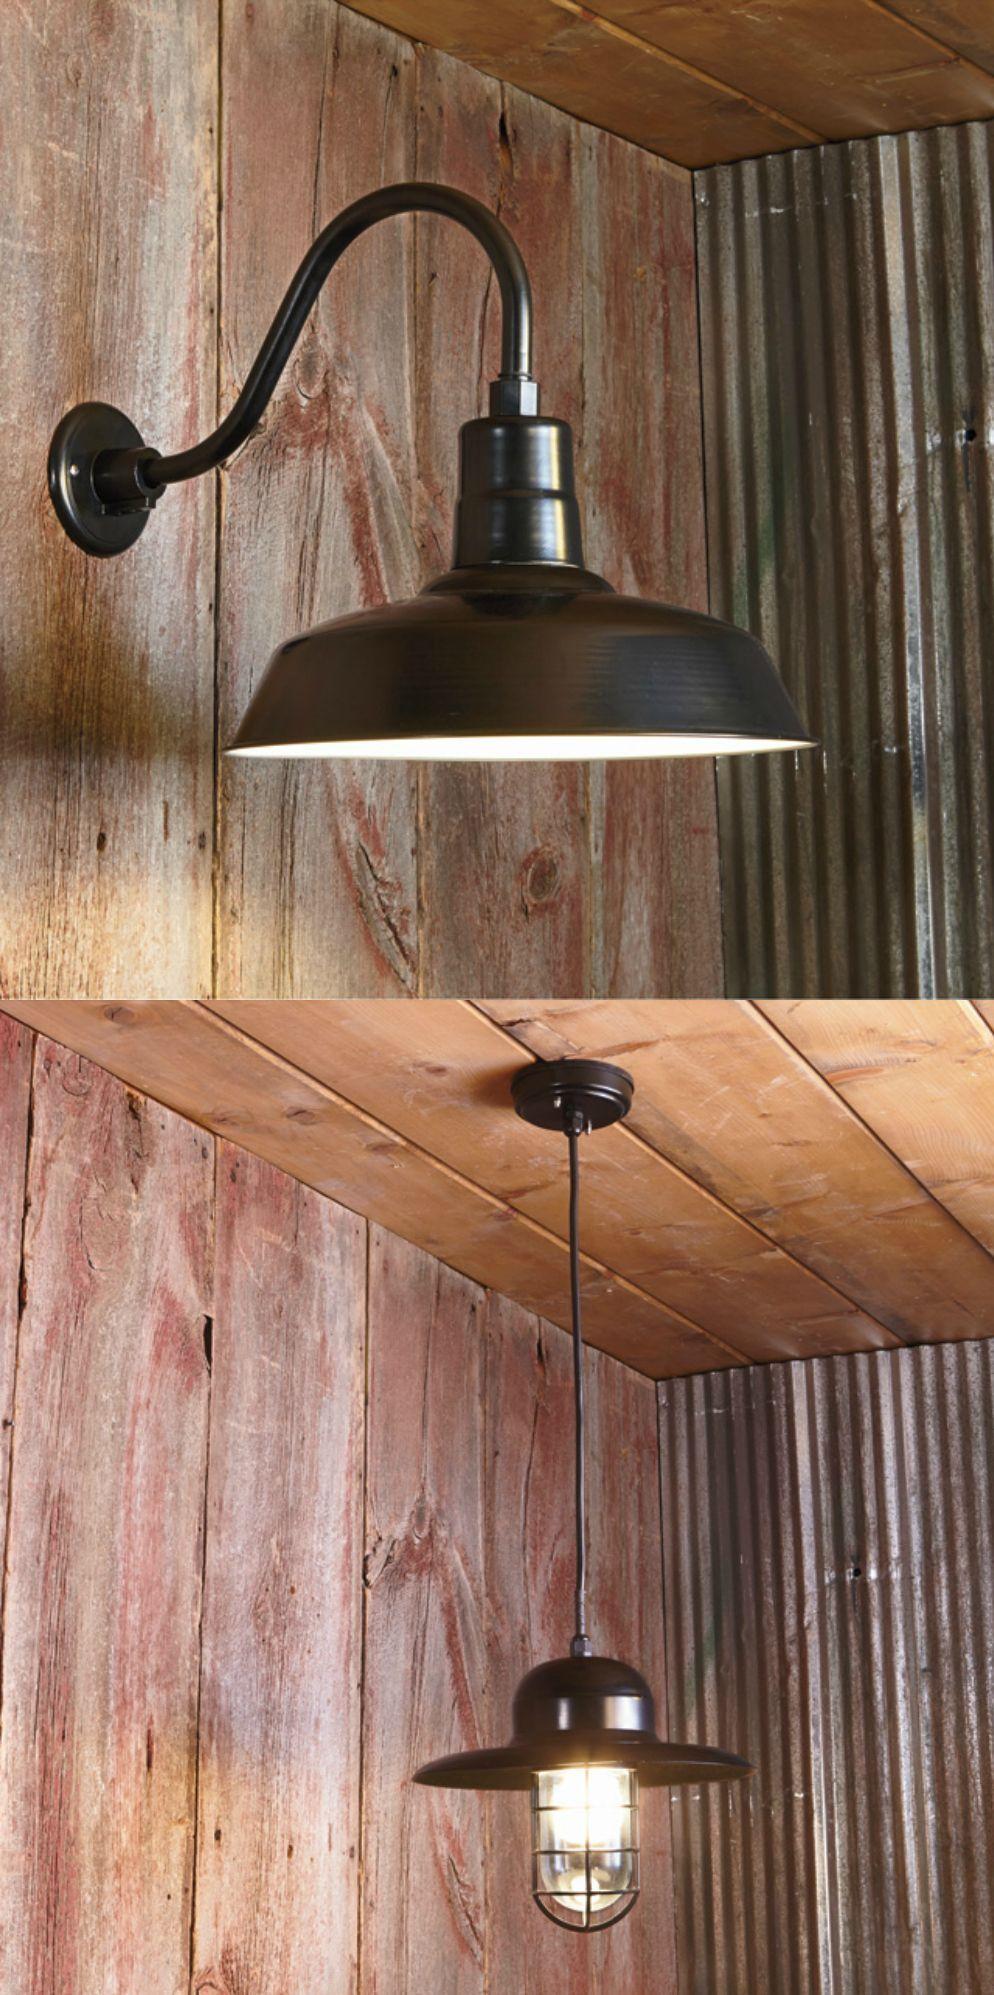 Reclaimed Barn Wood Light Fixtures Bar Restaurant Home Rustic Lighting With Http Centoph Rustic Kitchen Lighting Barn Wood Decor Wood Light Fixture